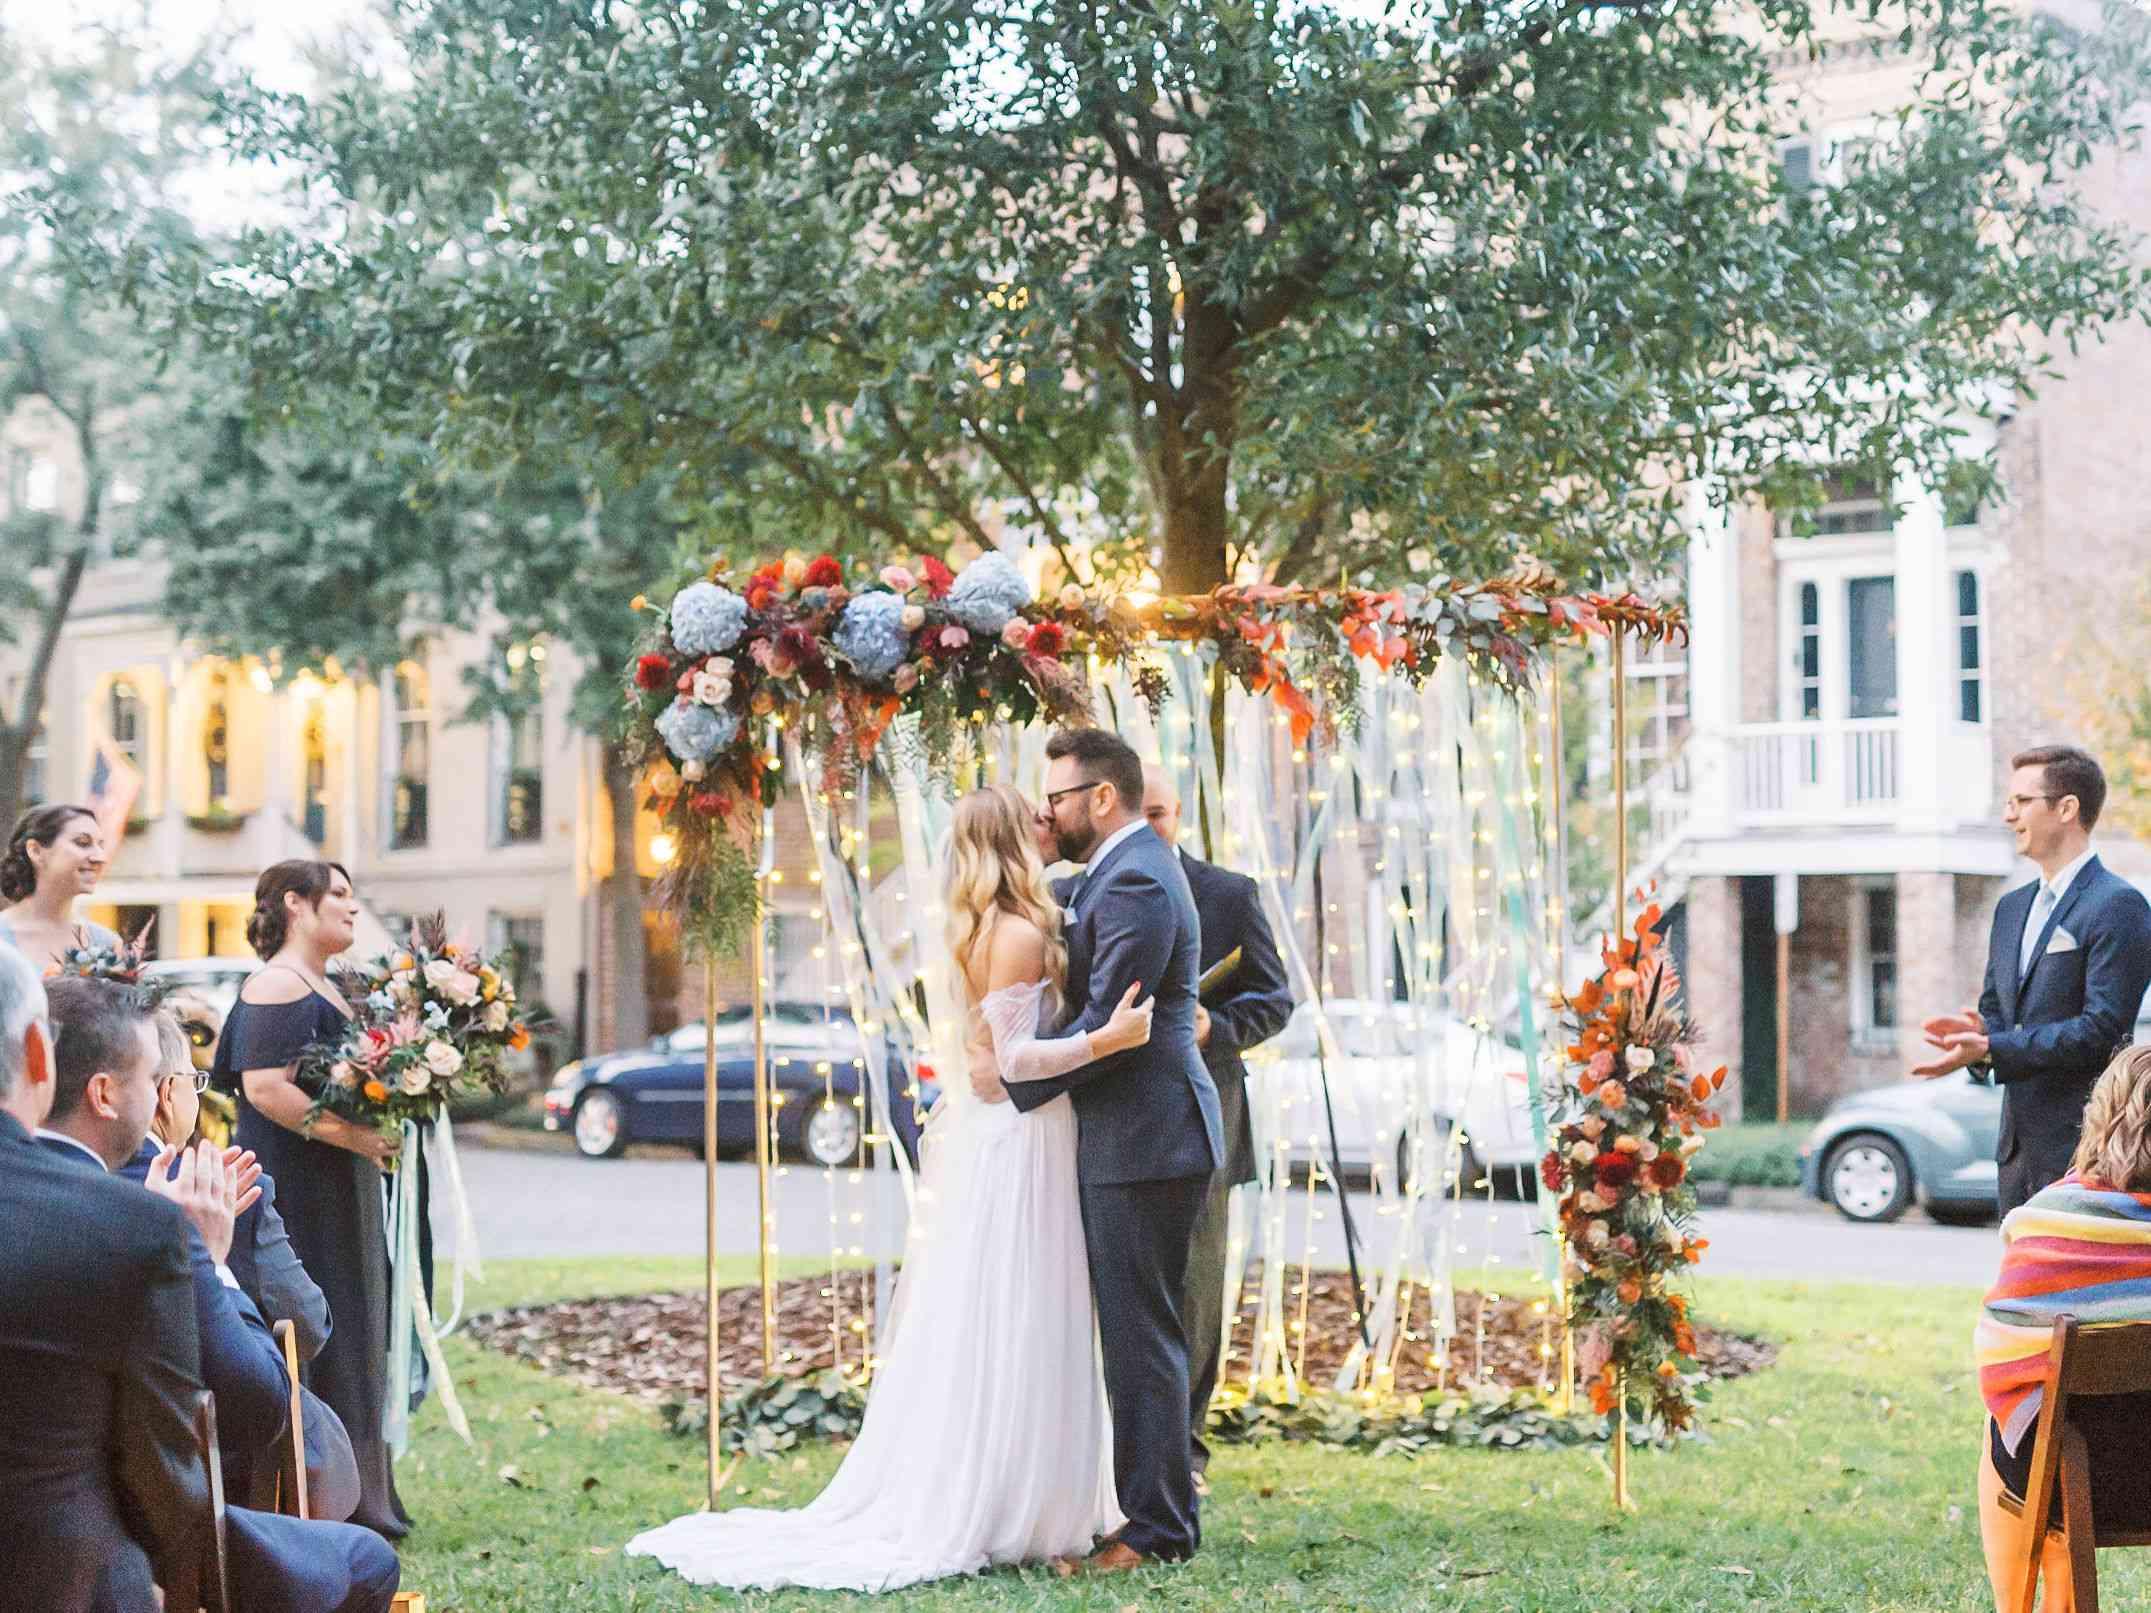 whimsical savannah wedding, bride and groom kissing ceremony